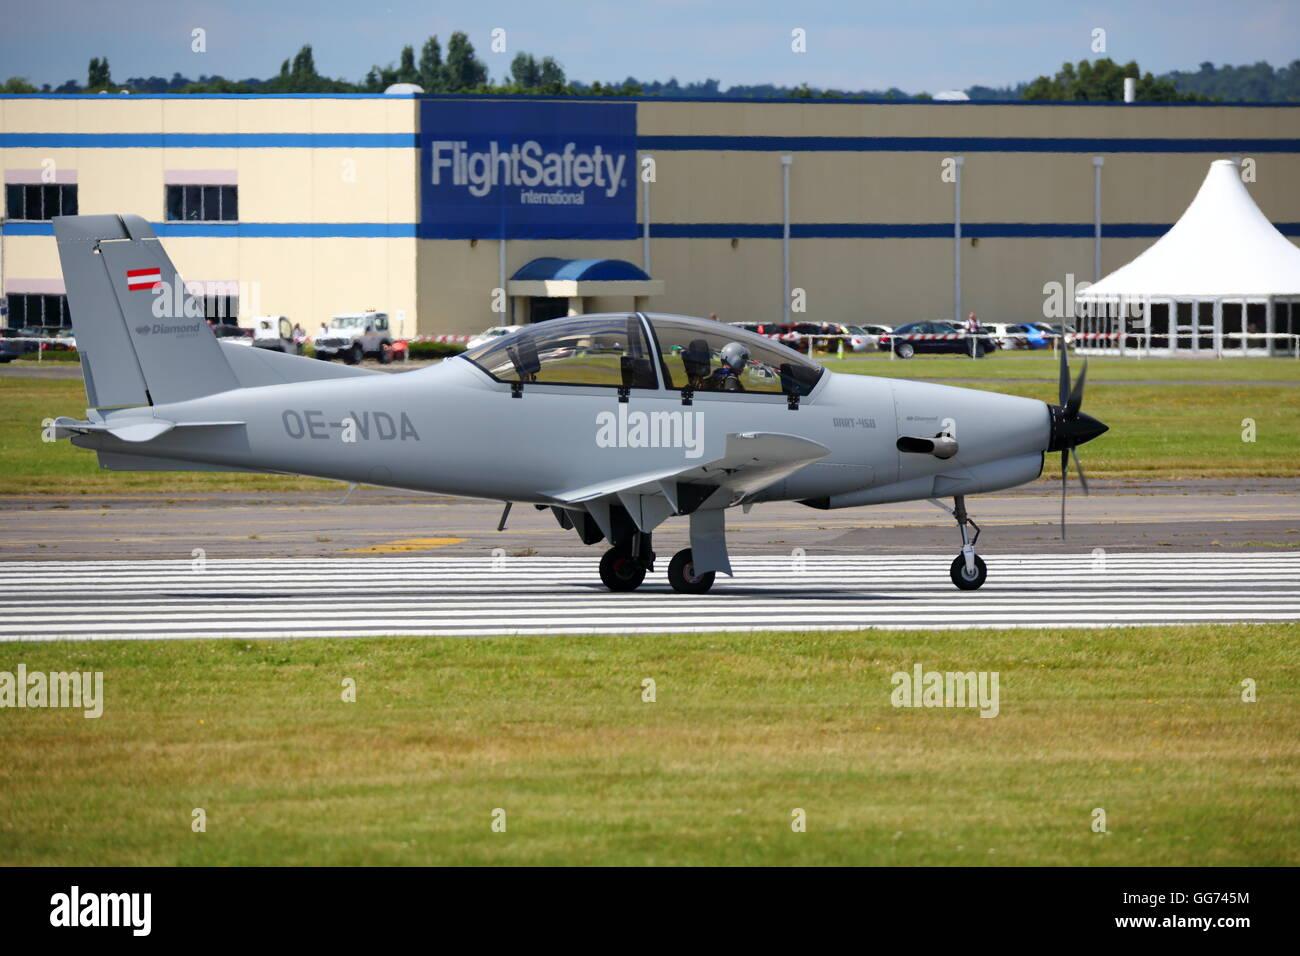 Dart 450 OE-VDA displayed at the Farnborough International Airshow 2016 - Stock Image